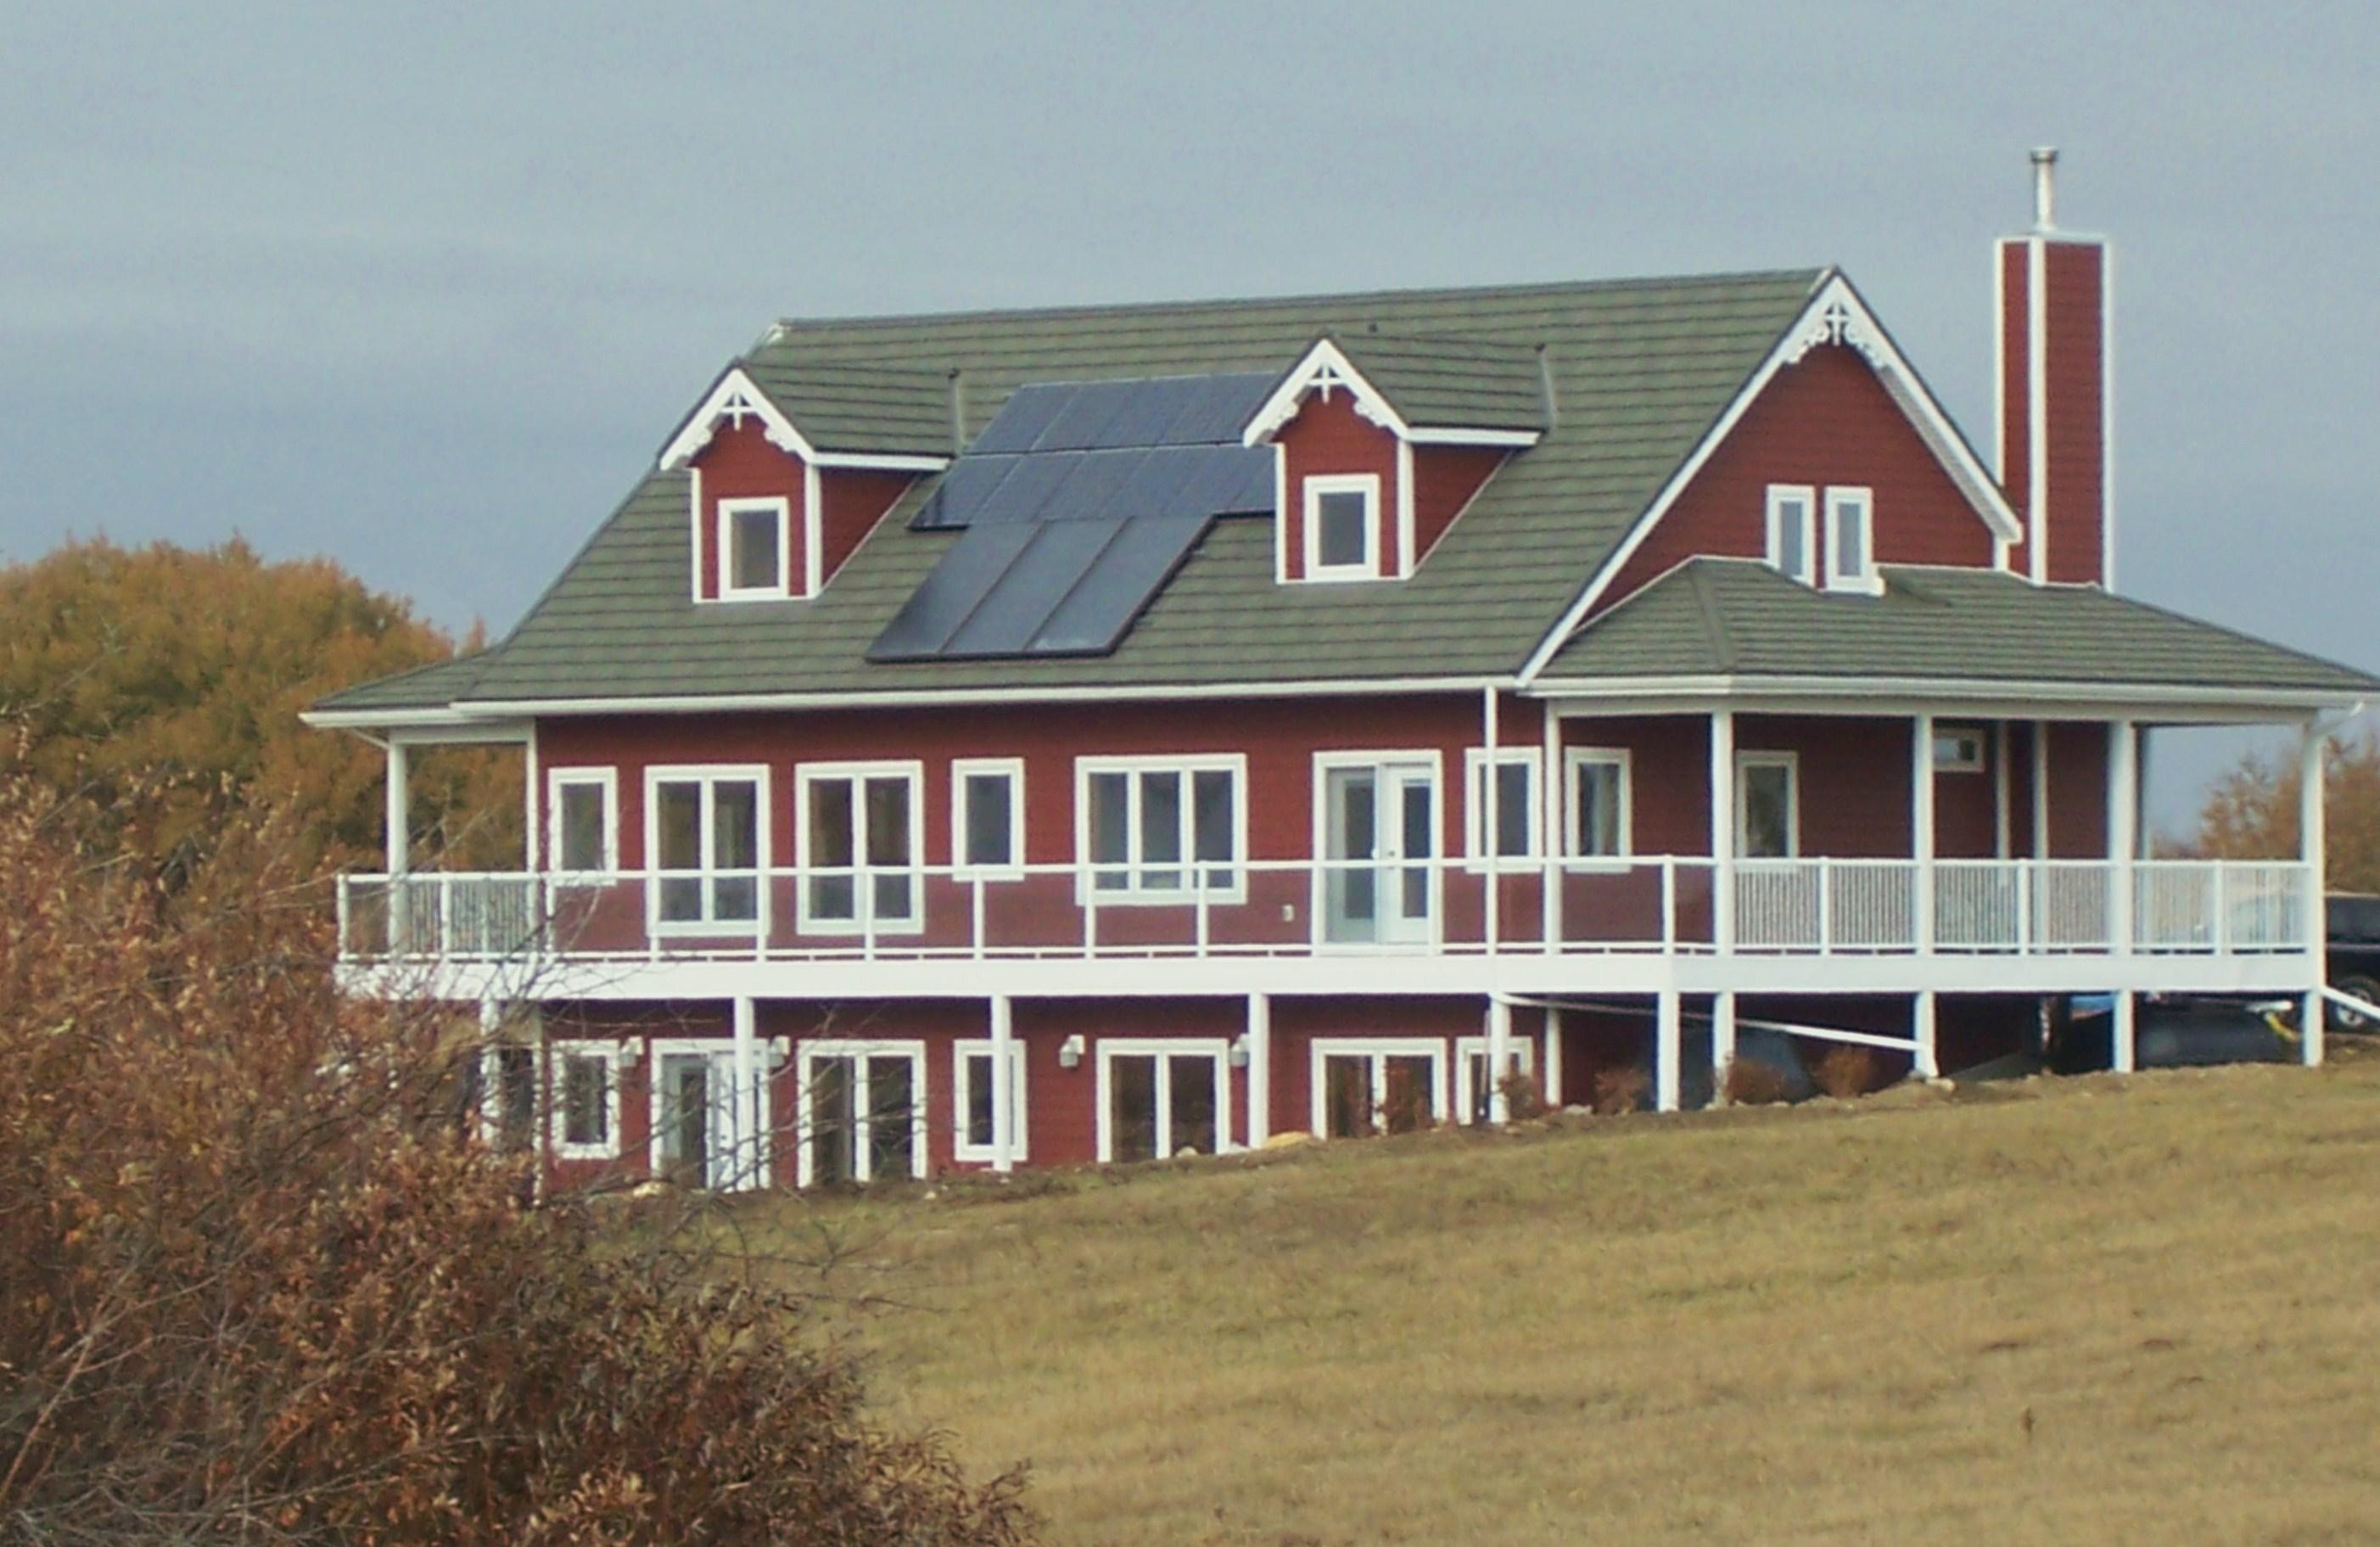 Home Design - Suncatcher Solar Suncatcher Solar on modern farmhouse exterior house designs, farm house floor plans and designs, farmhouse home designs, best modern farm house designs,